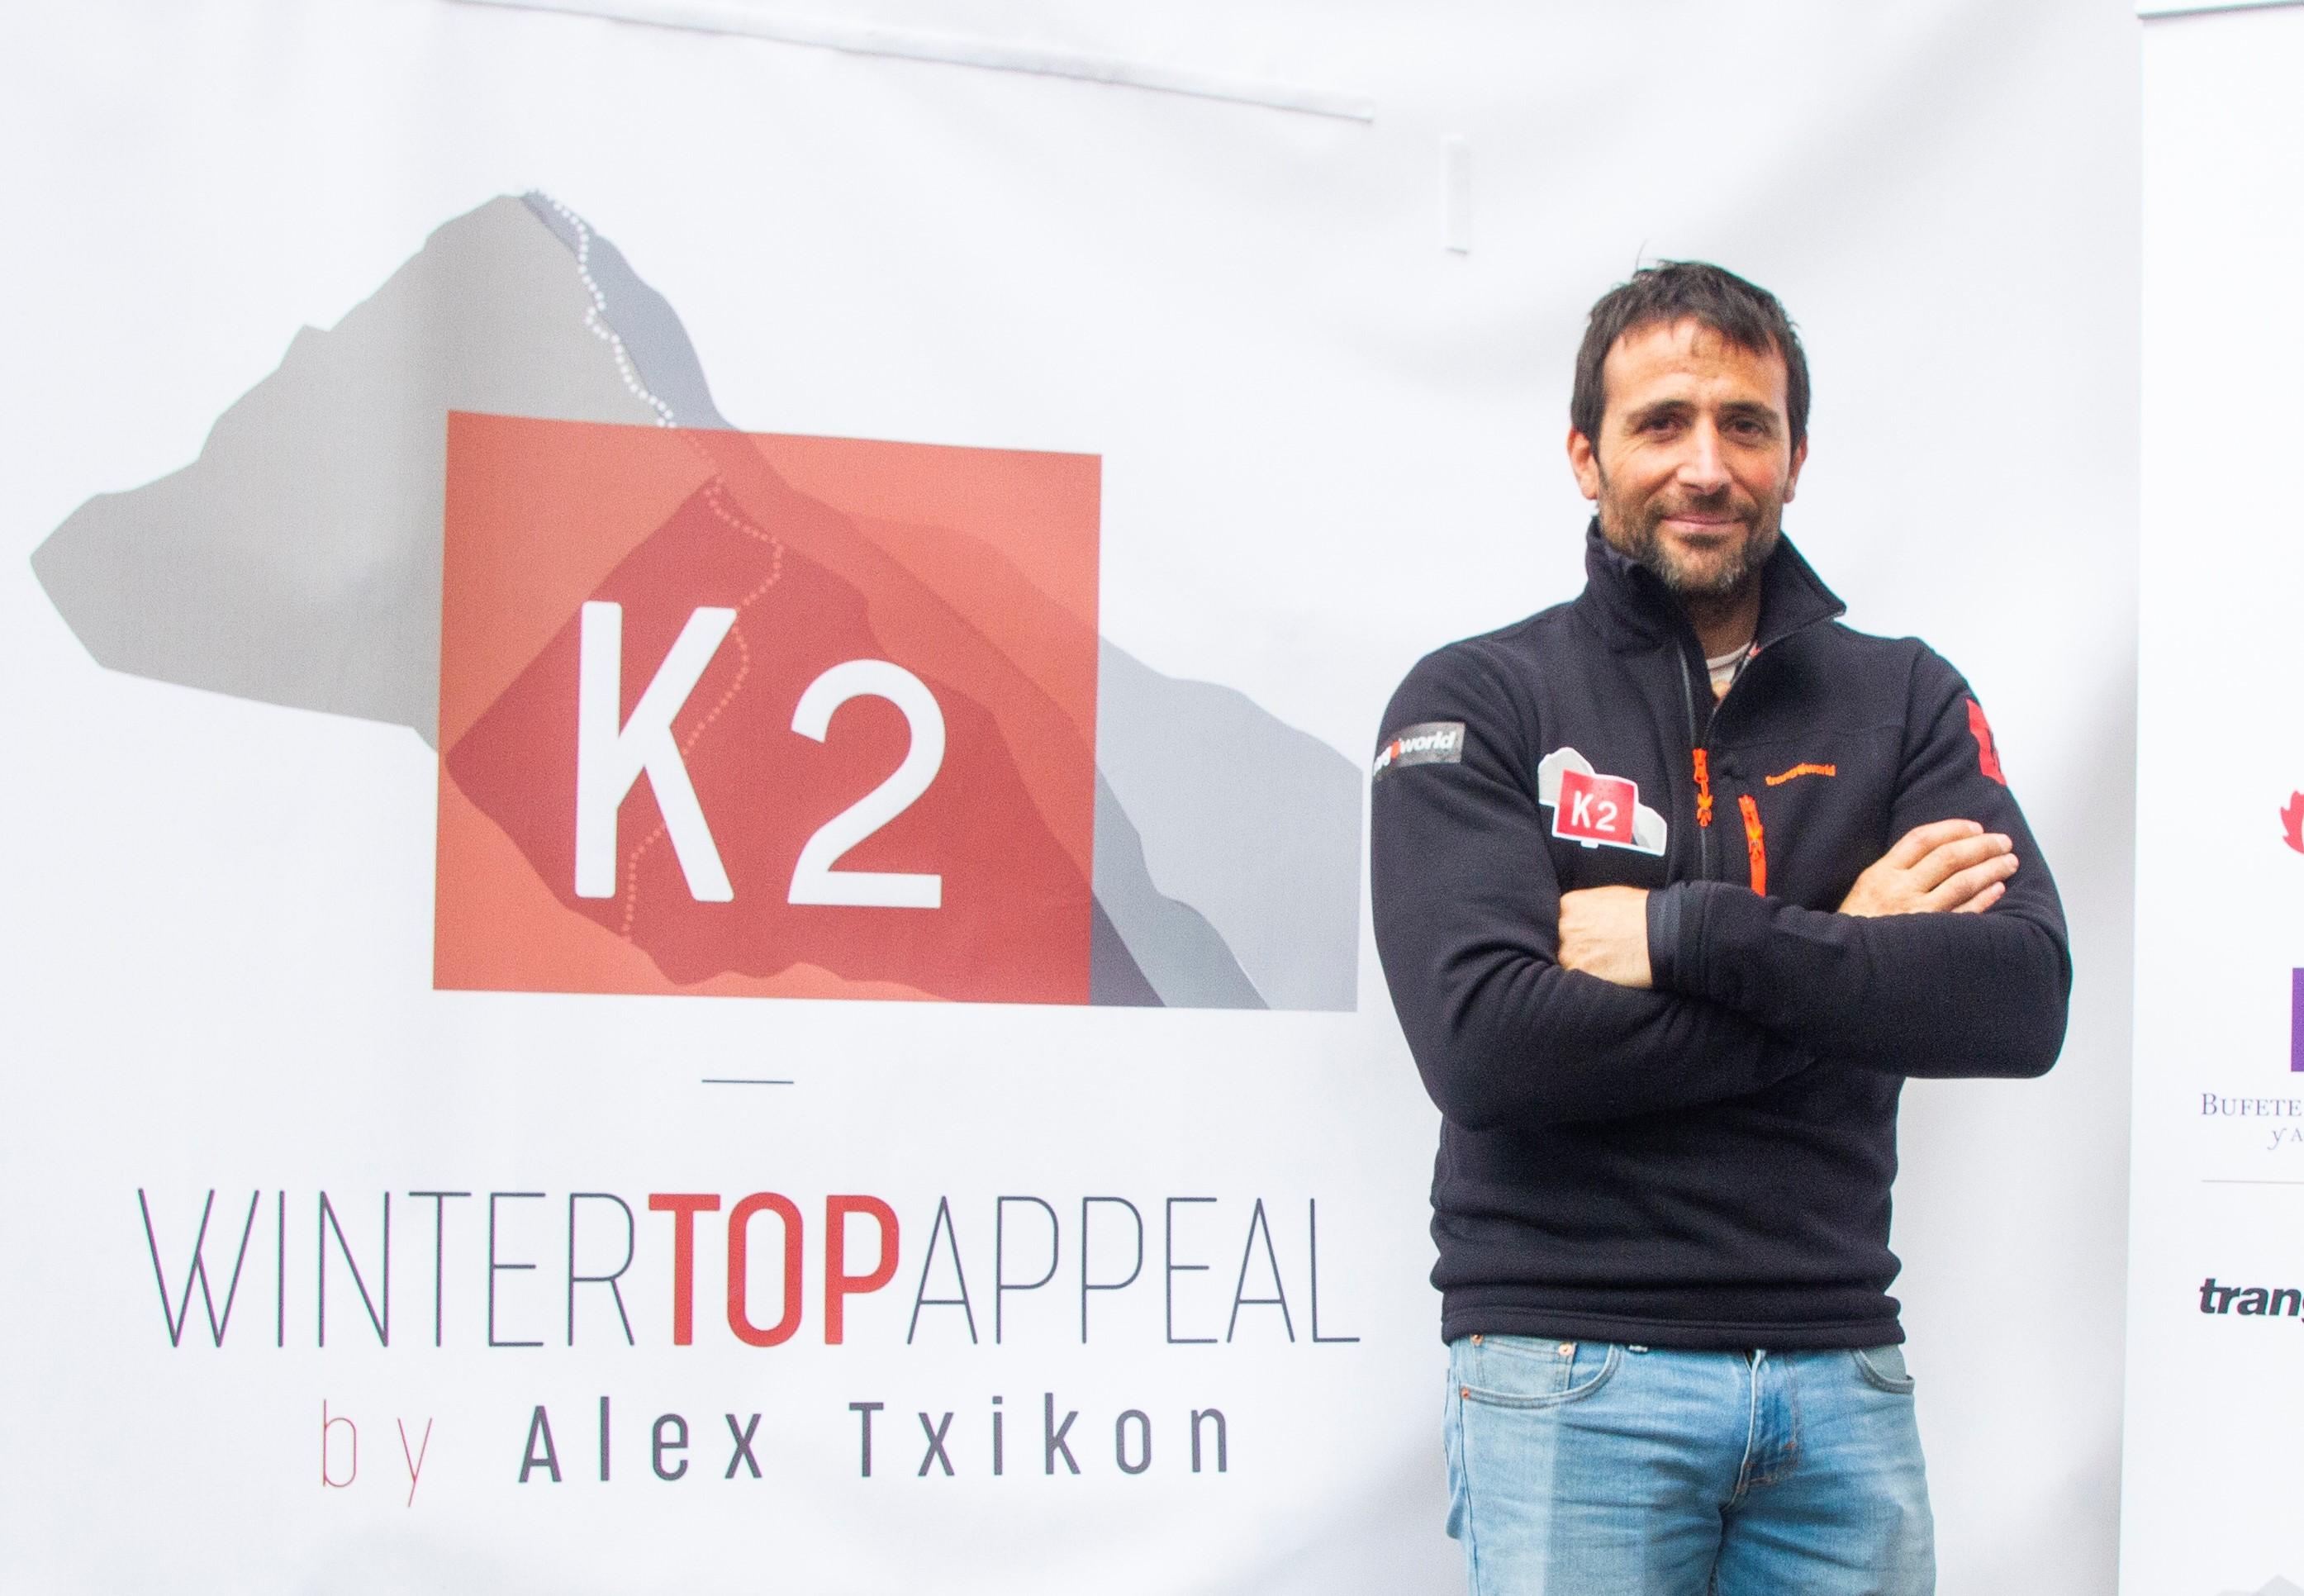 Alex Txikon during presentation of K2 Winter expedition 2019